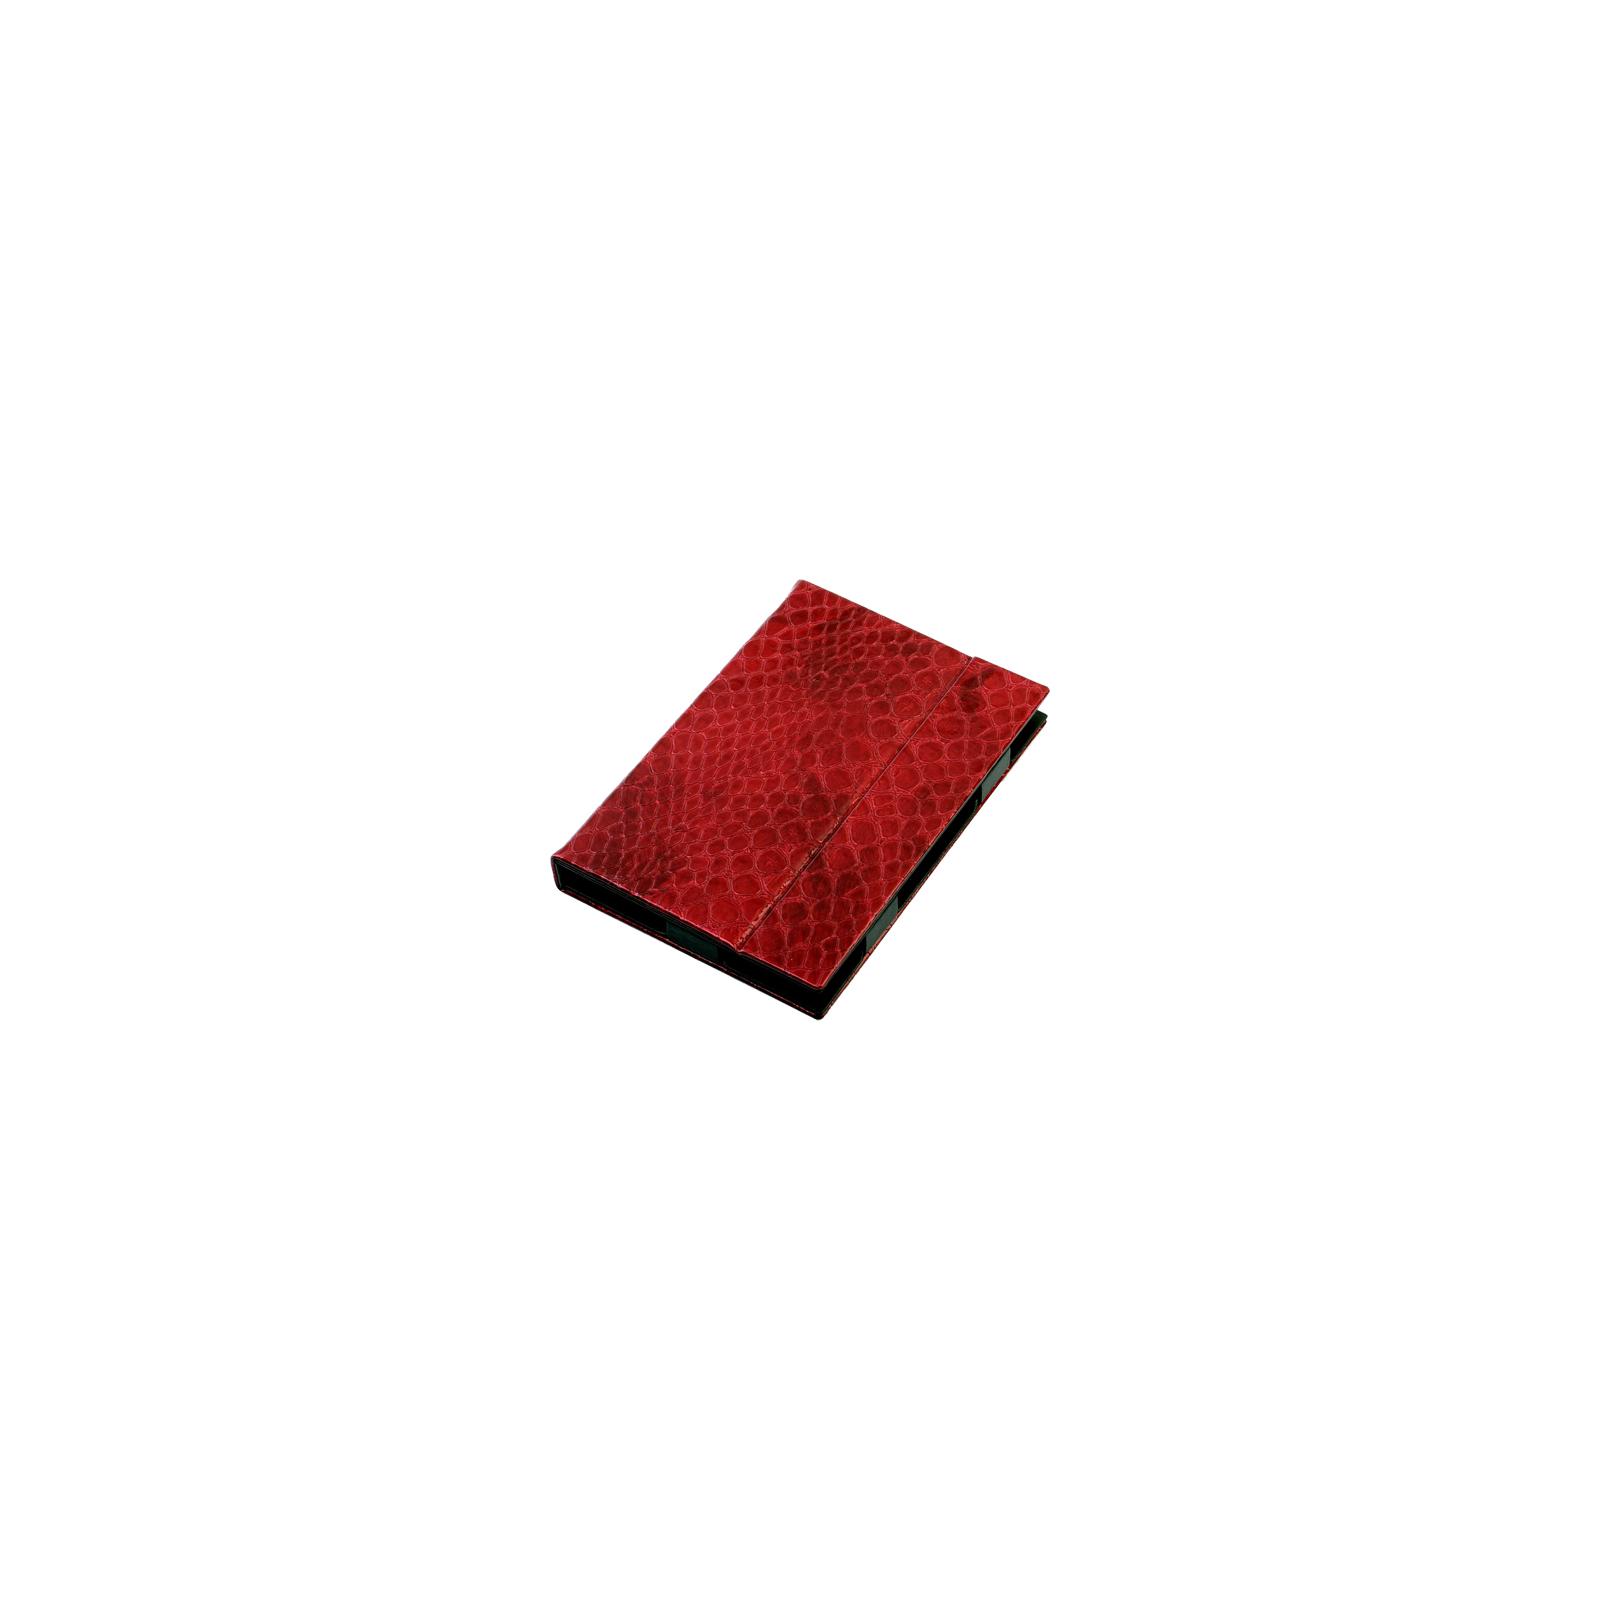 Чехол для планшета Vento 8 Desire glossy - red reptile